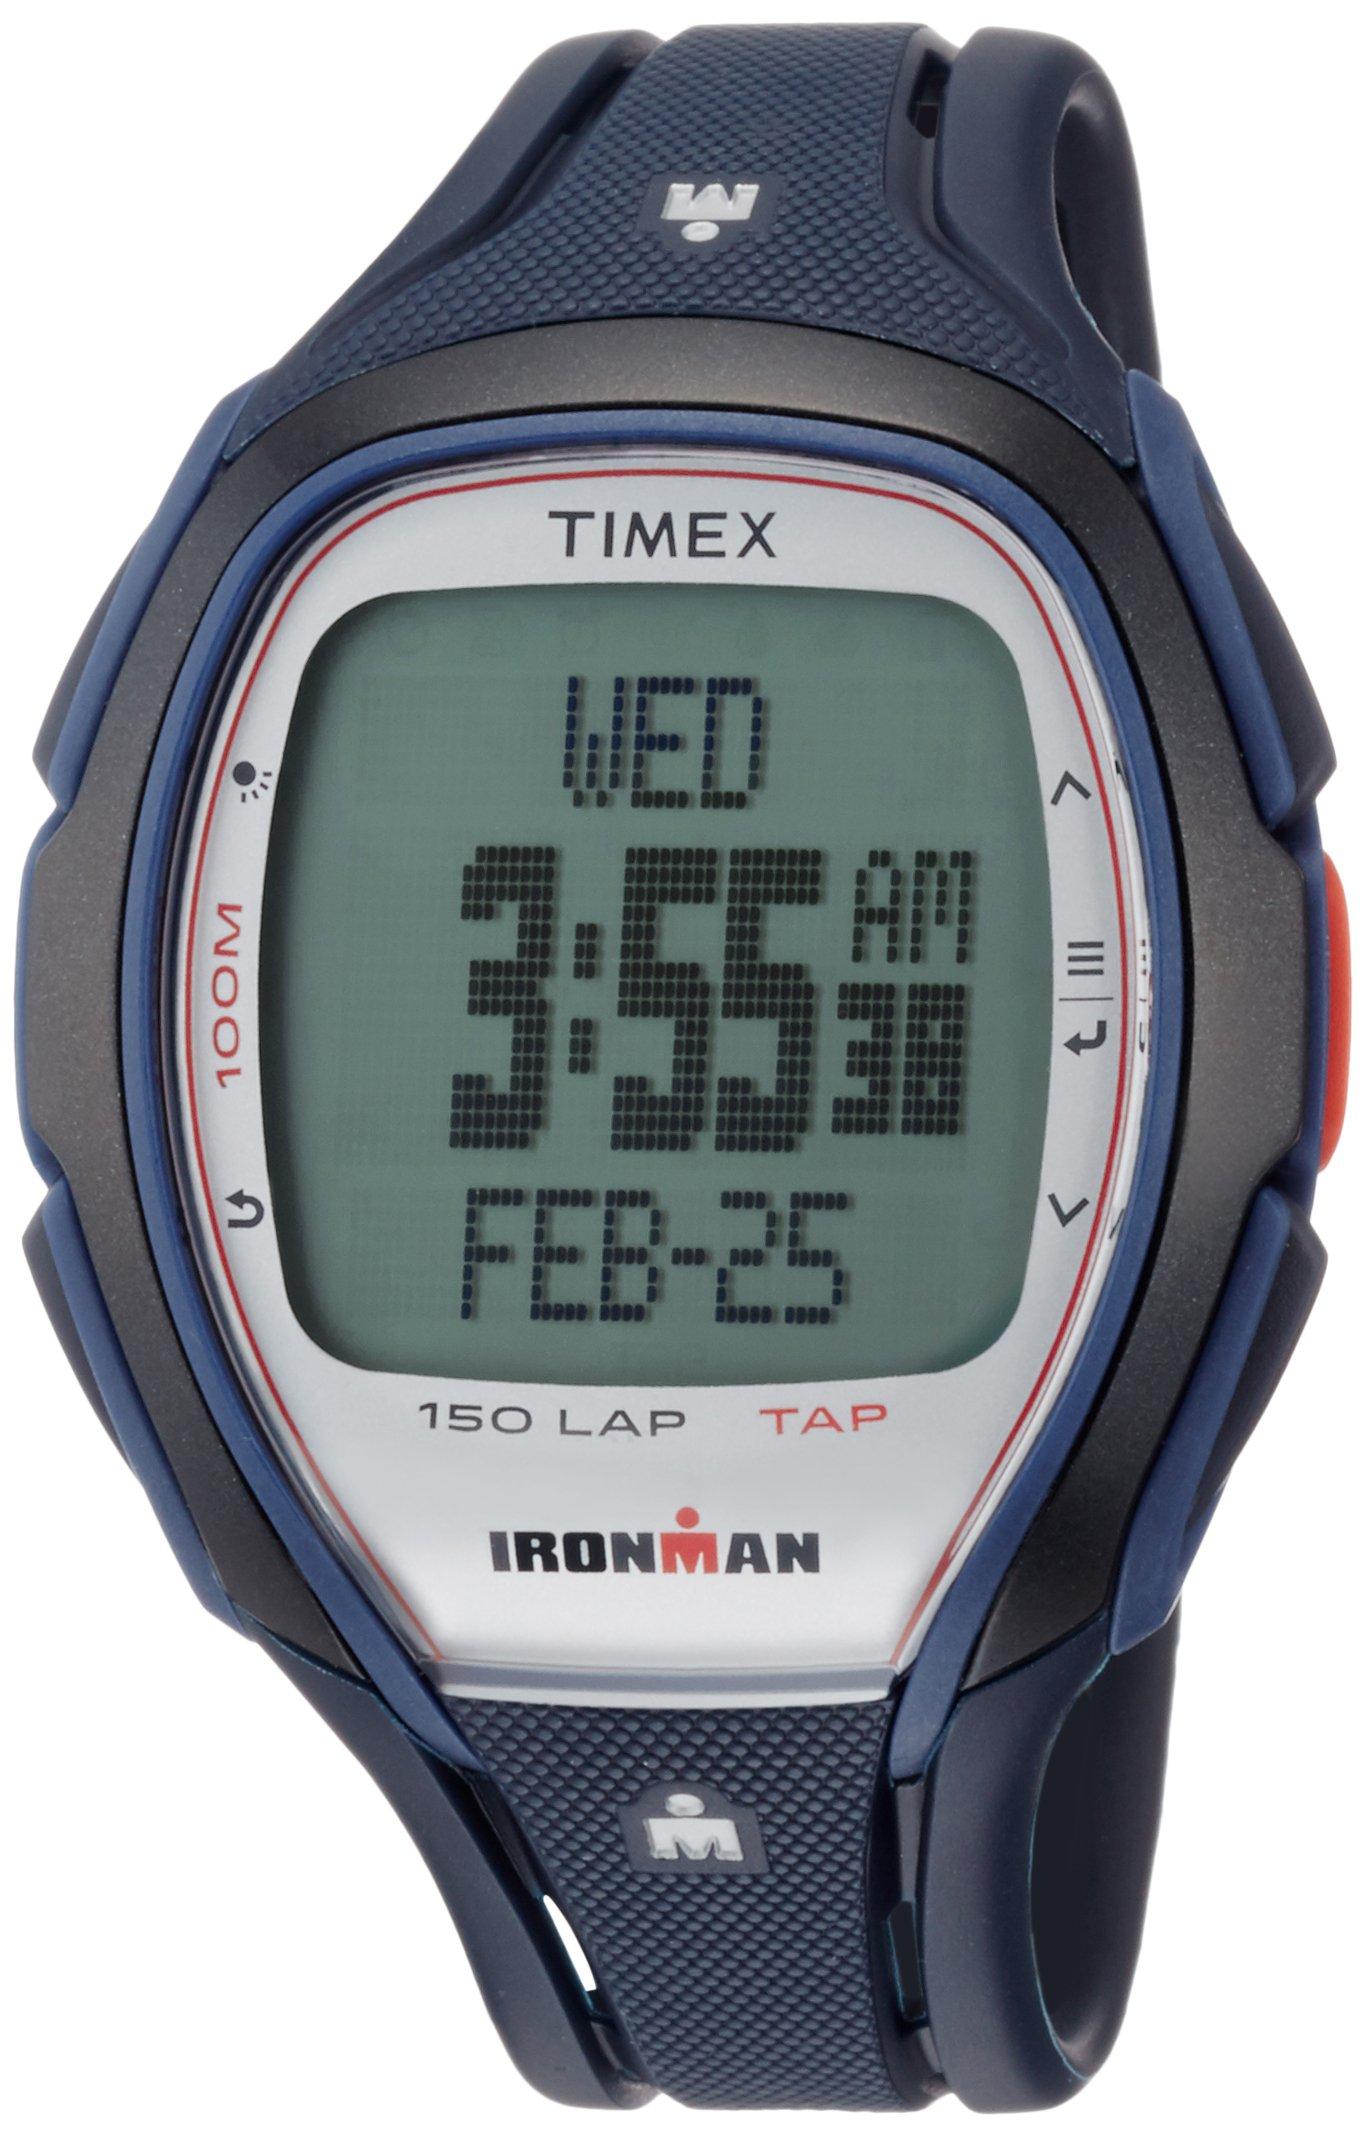 Timex Ironman Sleek 150 TW5K96500SU Ladies Watch / Mens Watch Chronograph